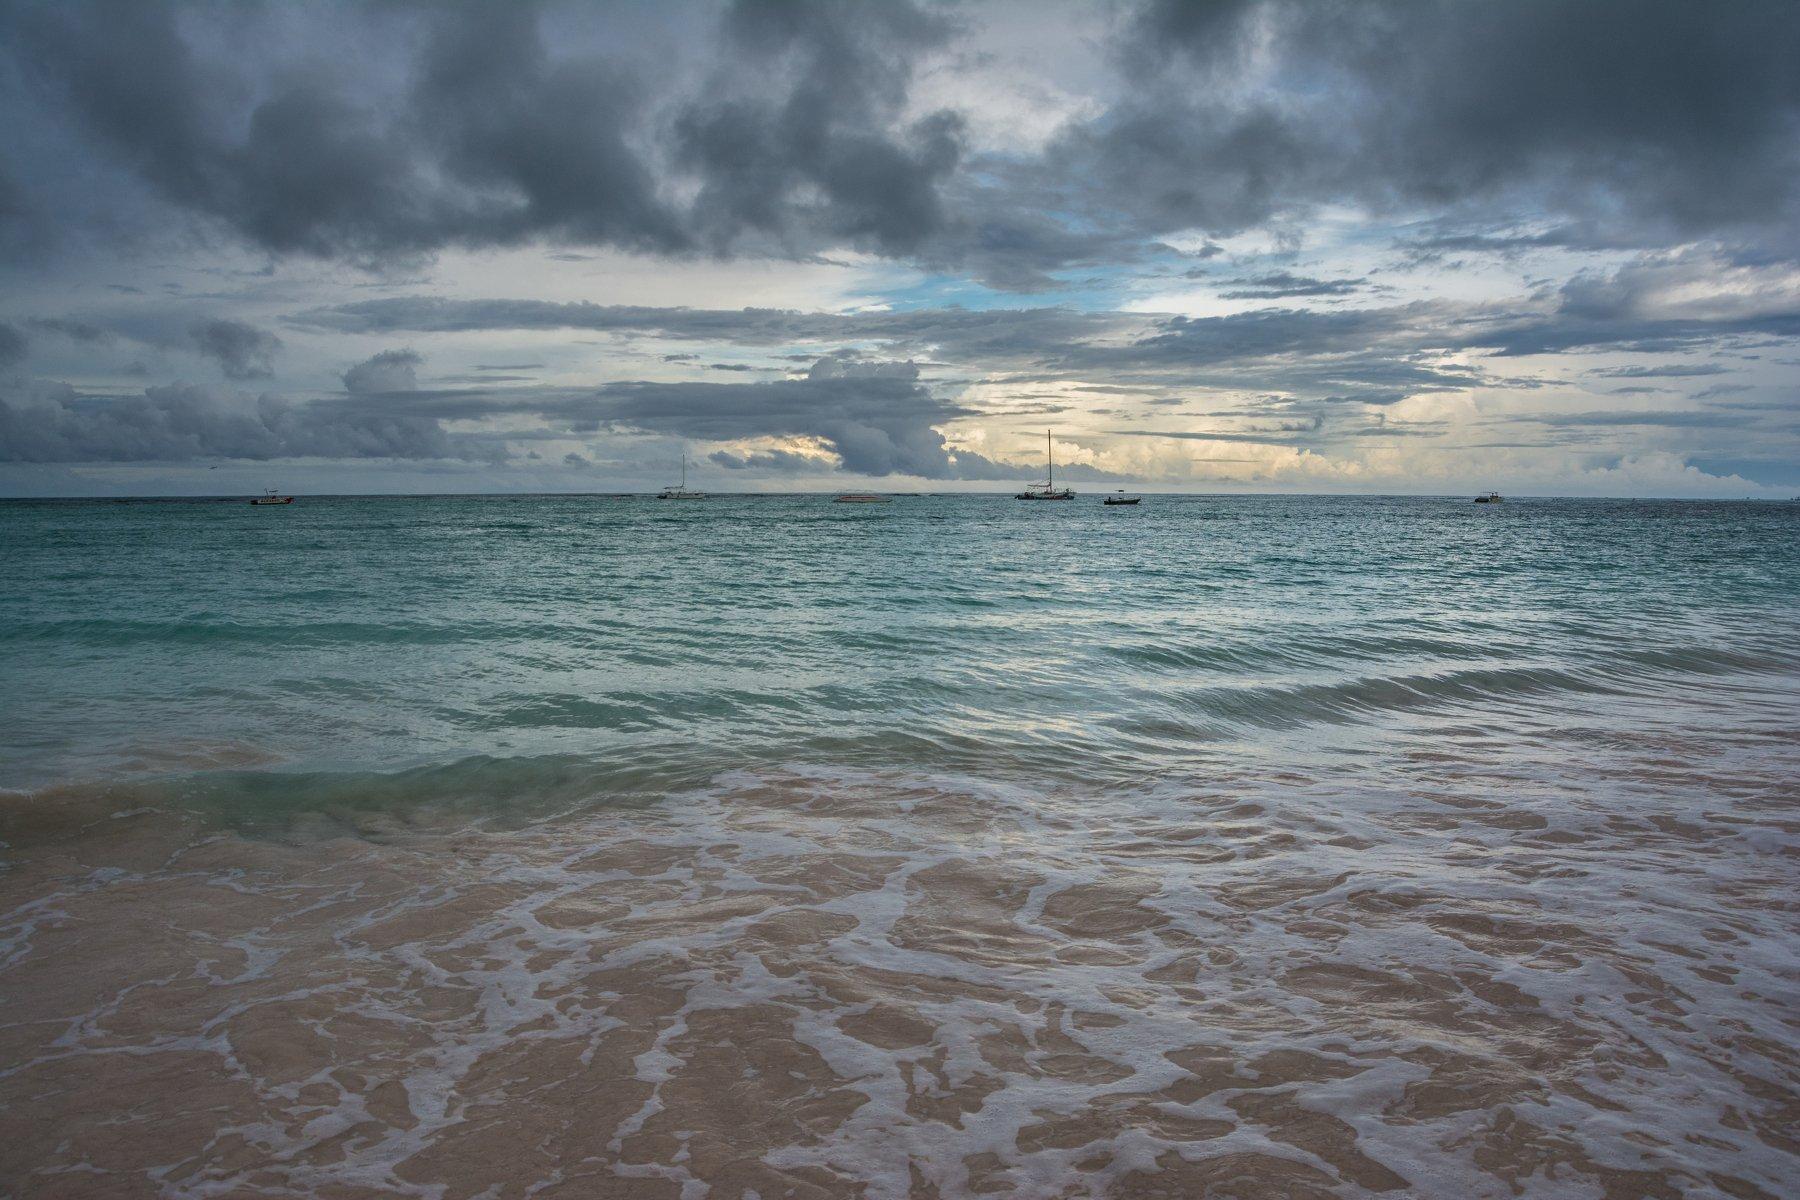 Атлантика, океан, небо, облака, яхты, вода, море, лето, утро, путешествие, пейзаж, природа, стихии, Sergey Oslopov